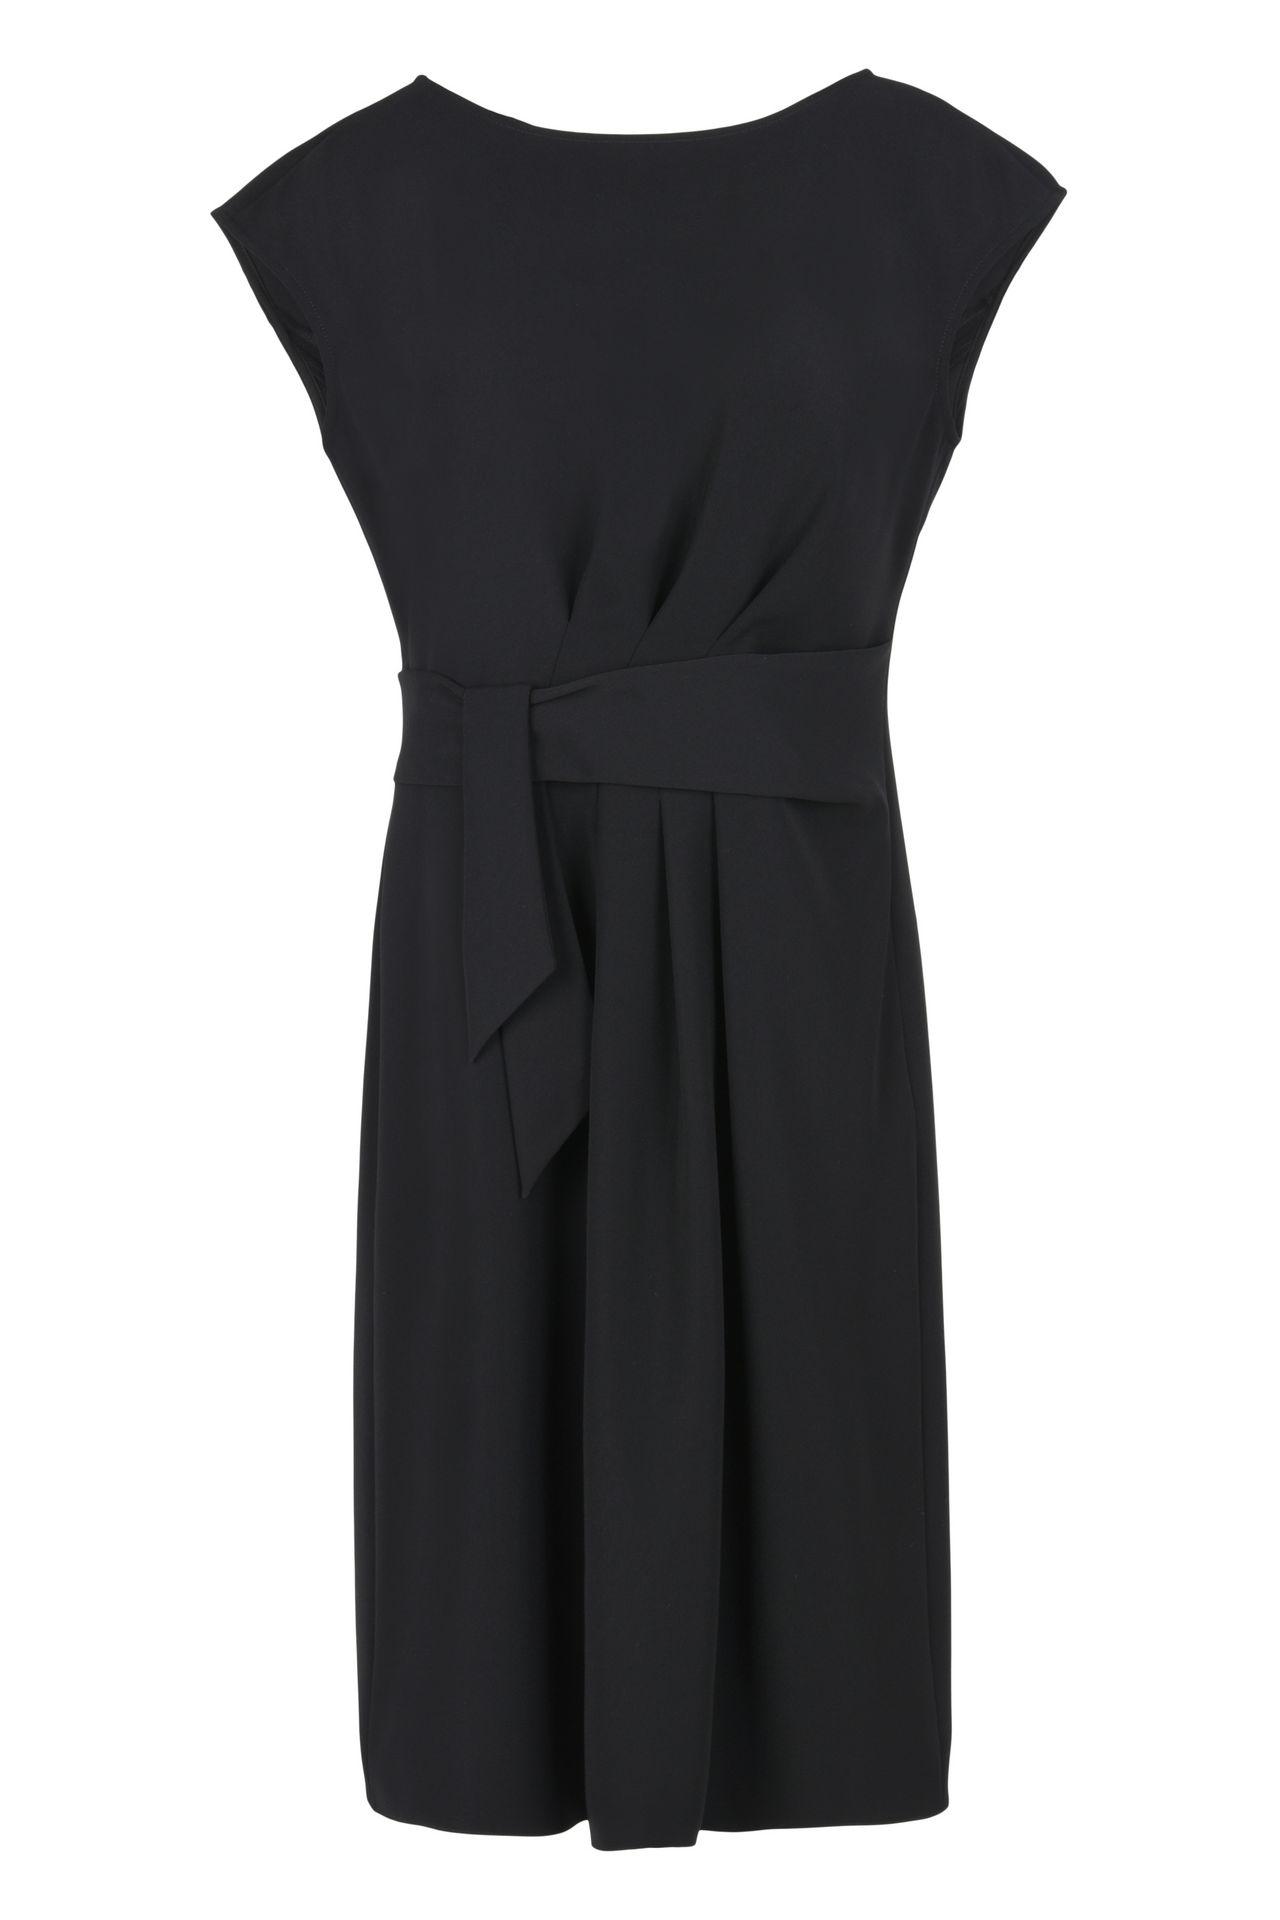 armani collezioni georgette dress with fabric belt